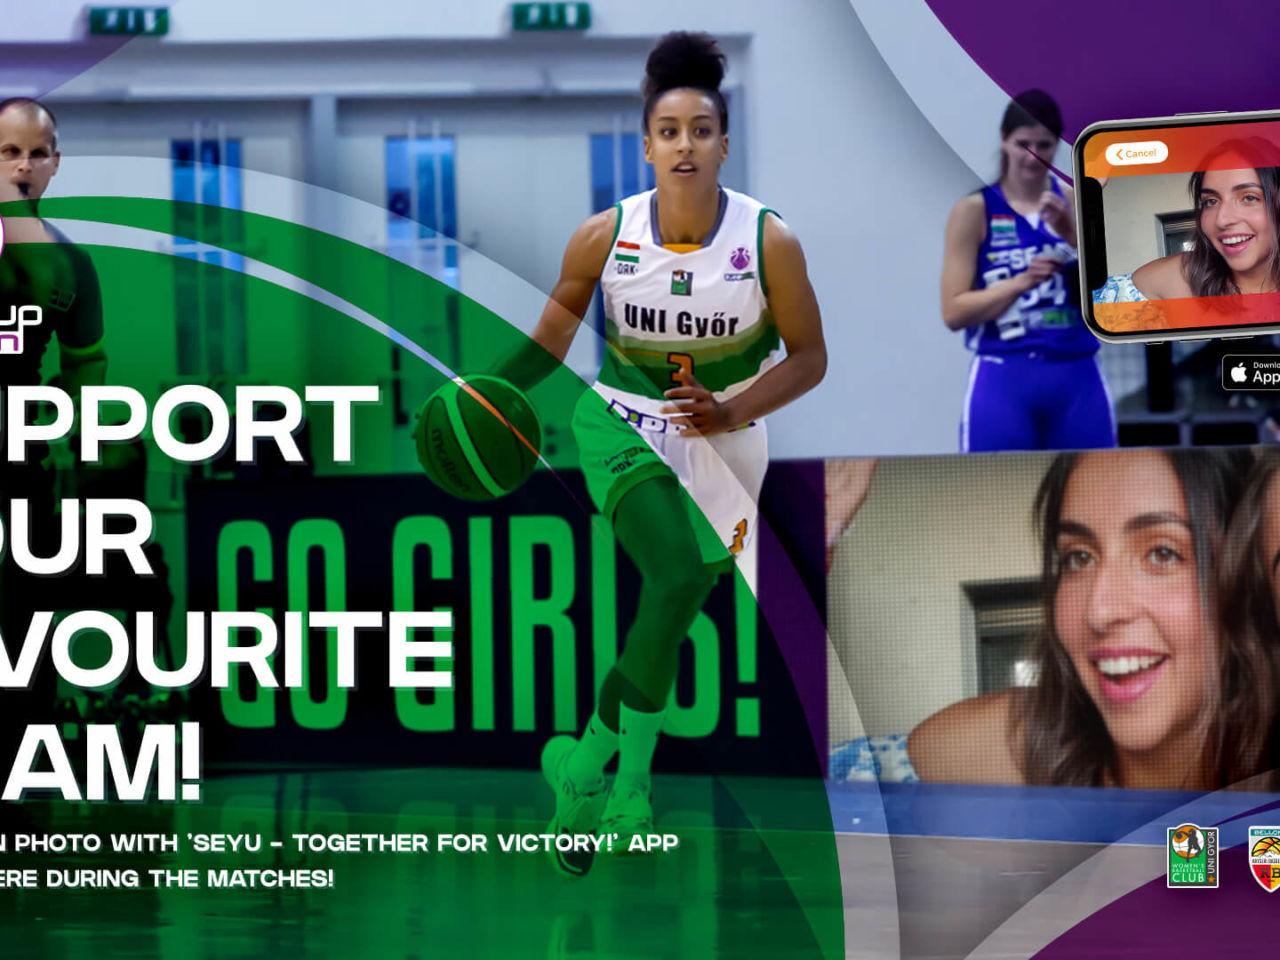 FIBA_Seyu_EuroCuoPosterUNIGYOR_16-9_ENG_13012021